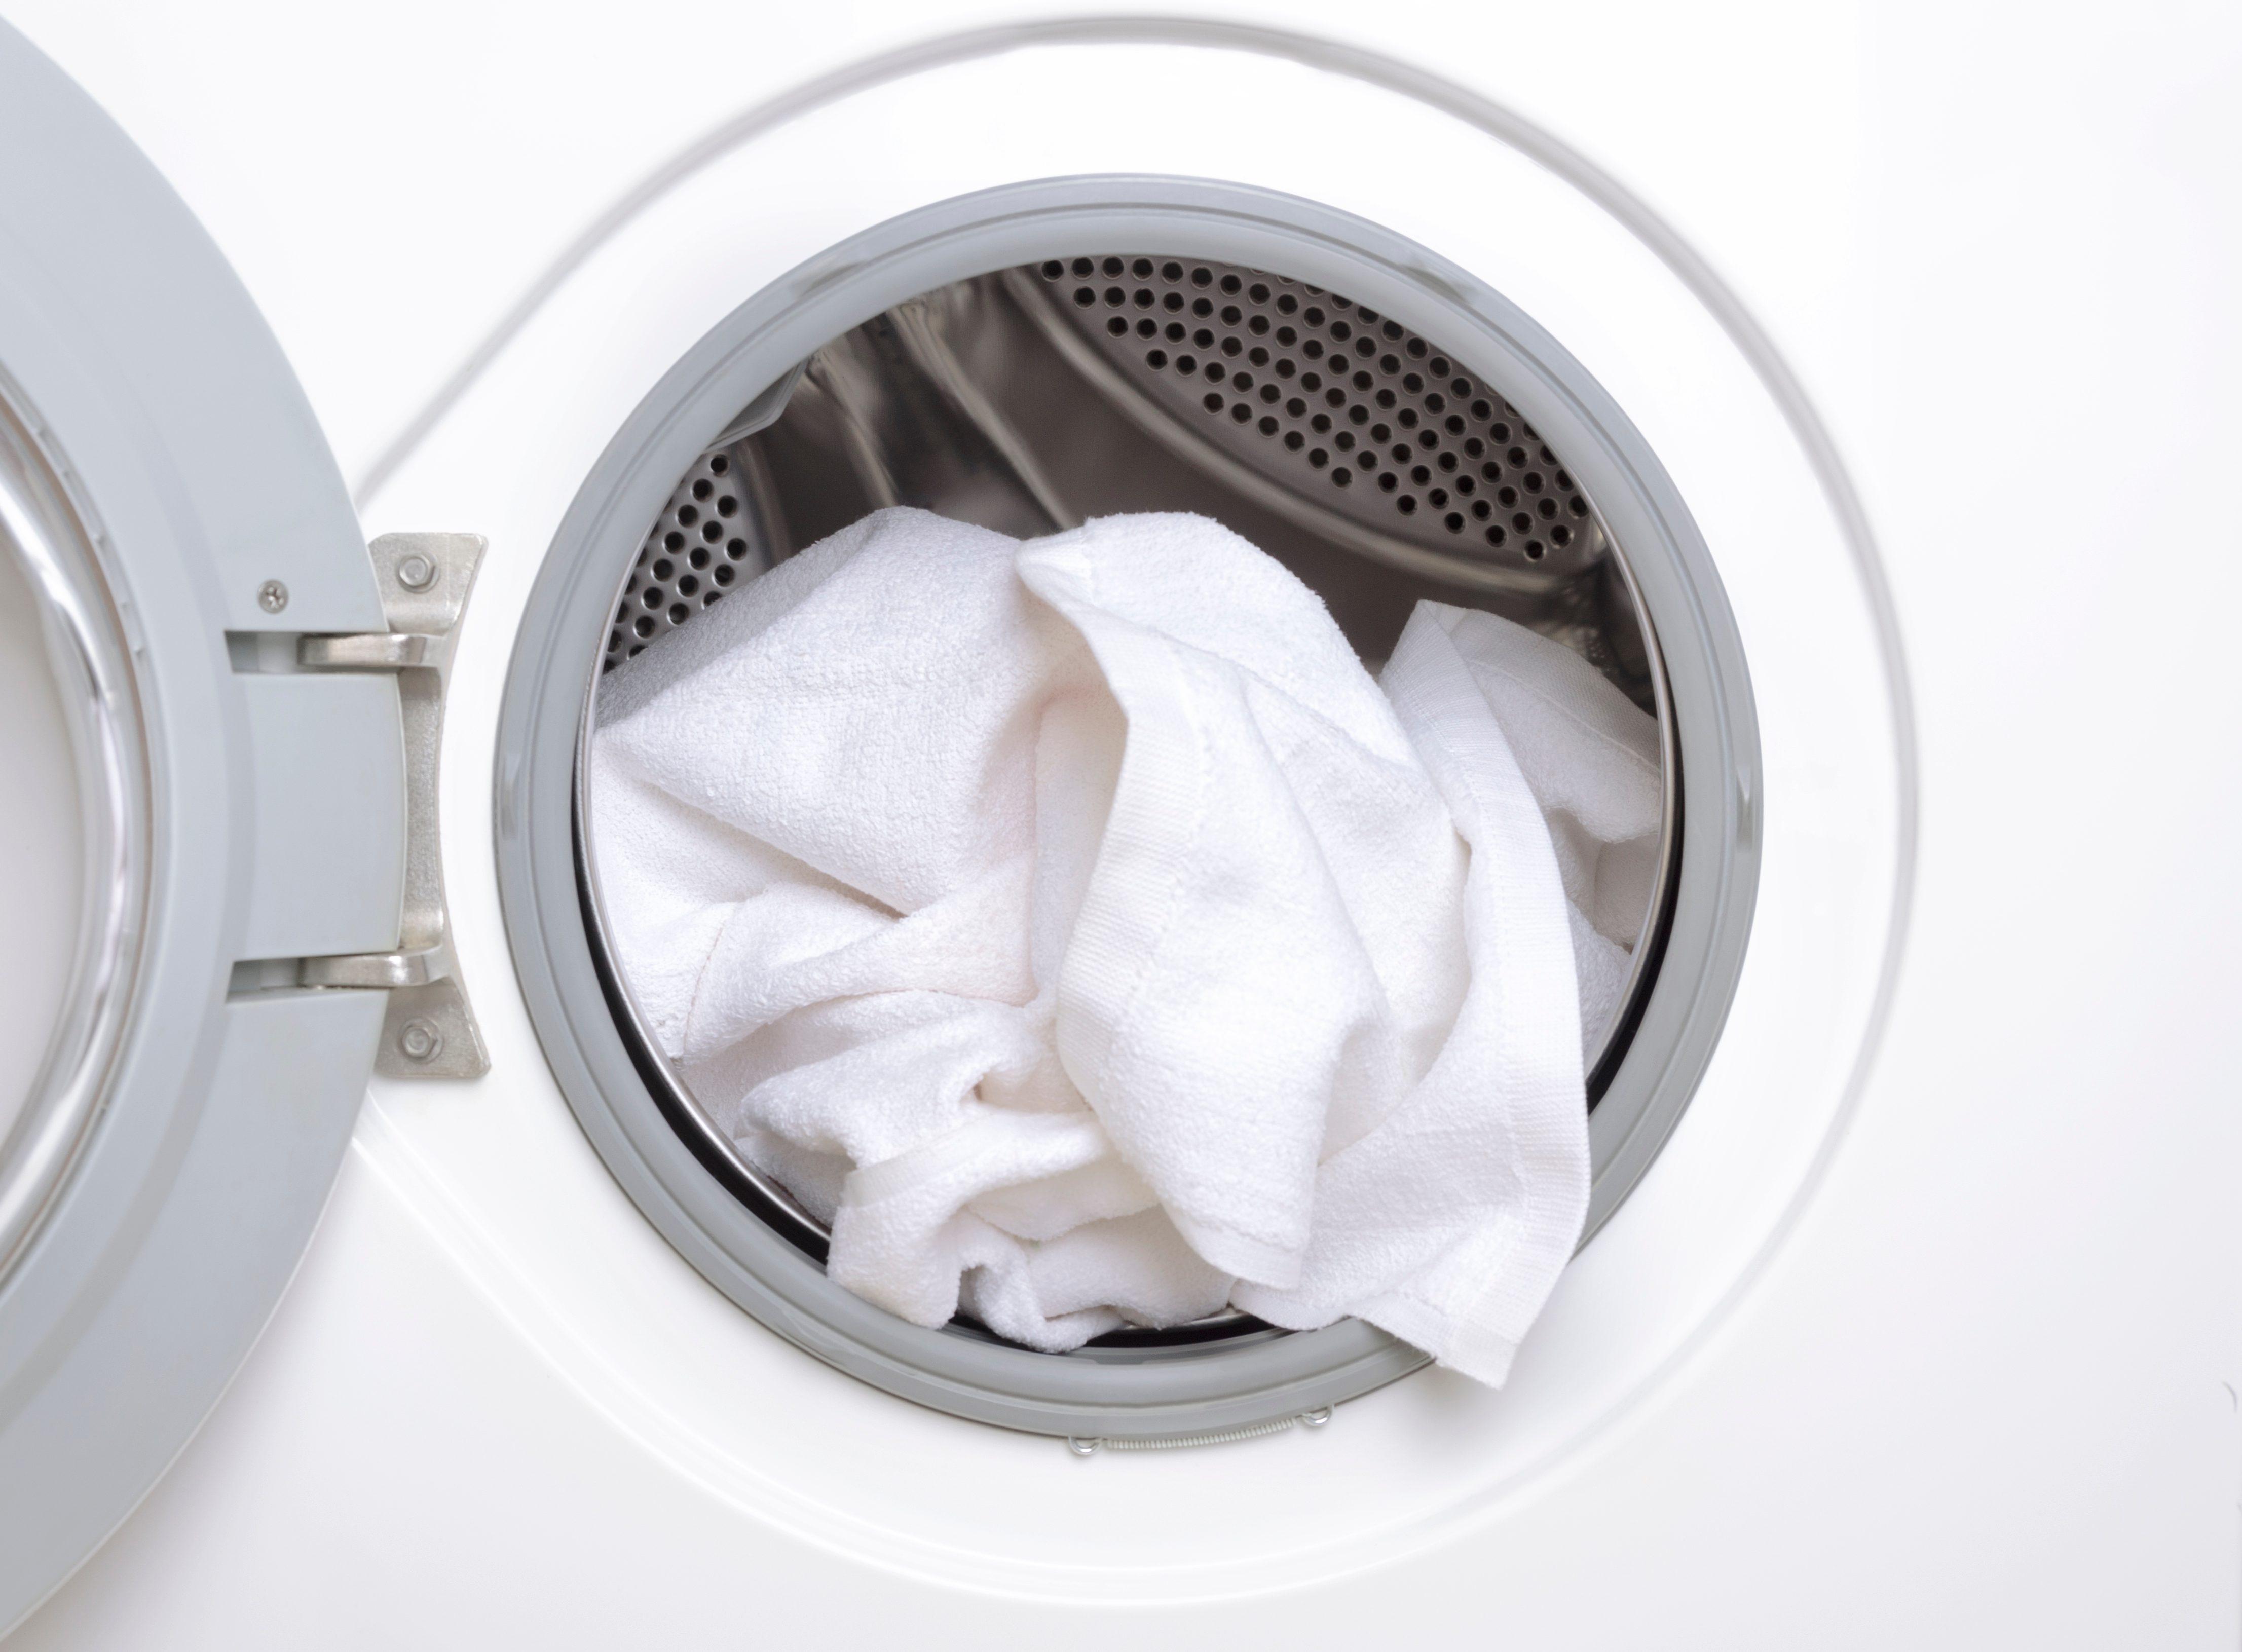 Finishing a part house, washing the white towels.Closeup of washing machine drum